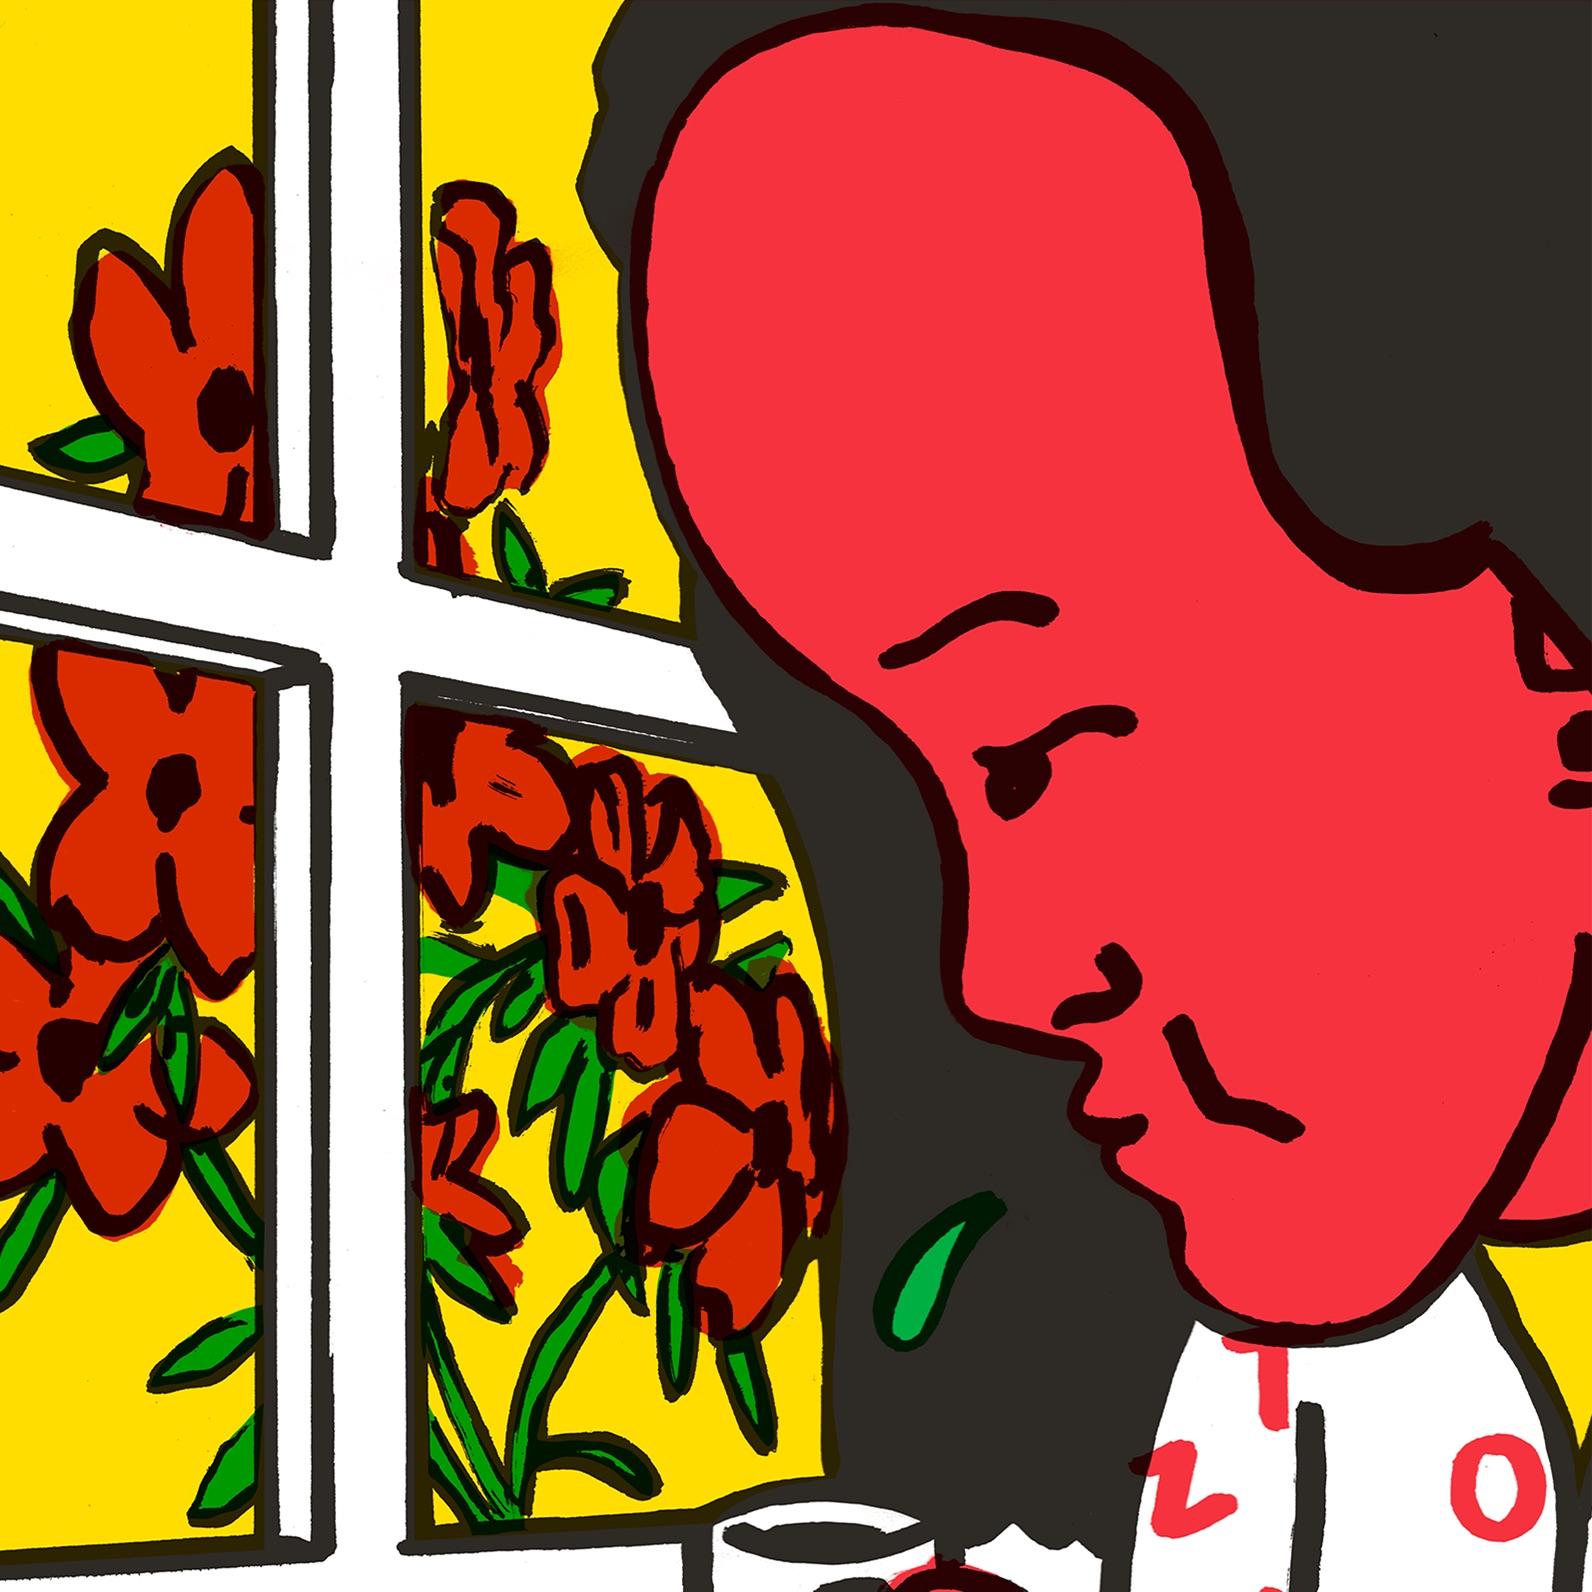 Windowpane, Joe Kessler